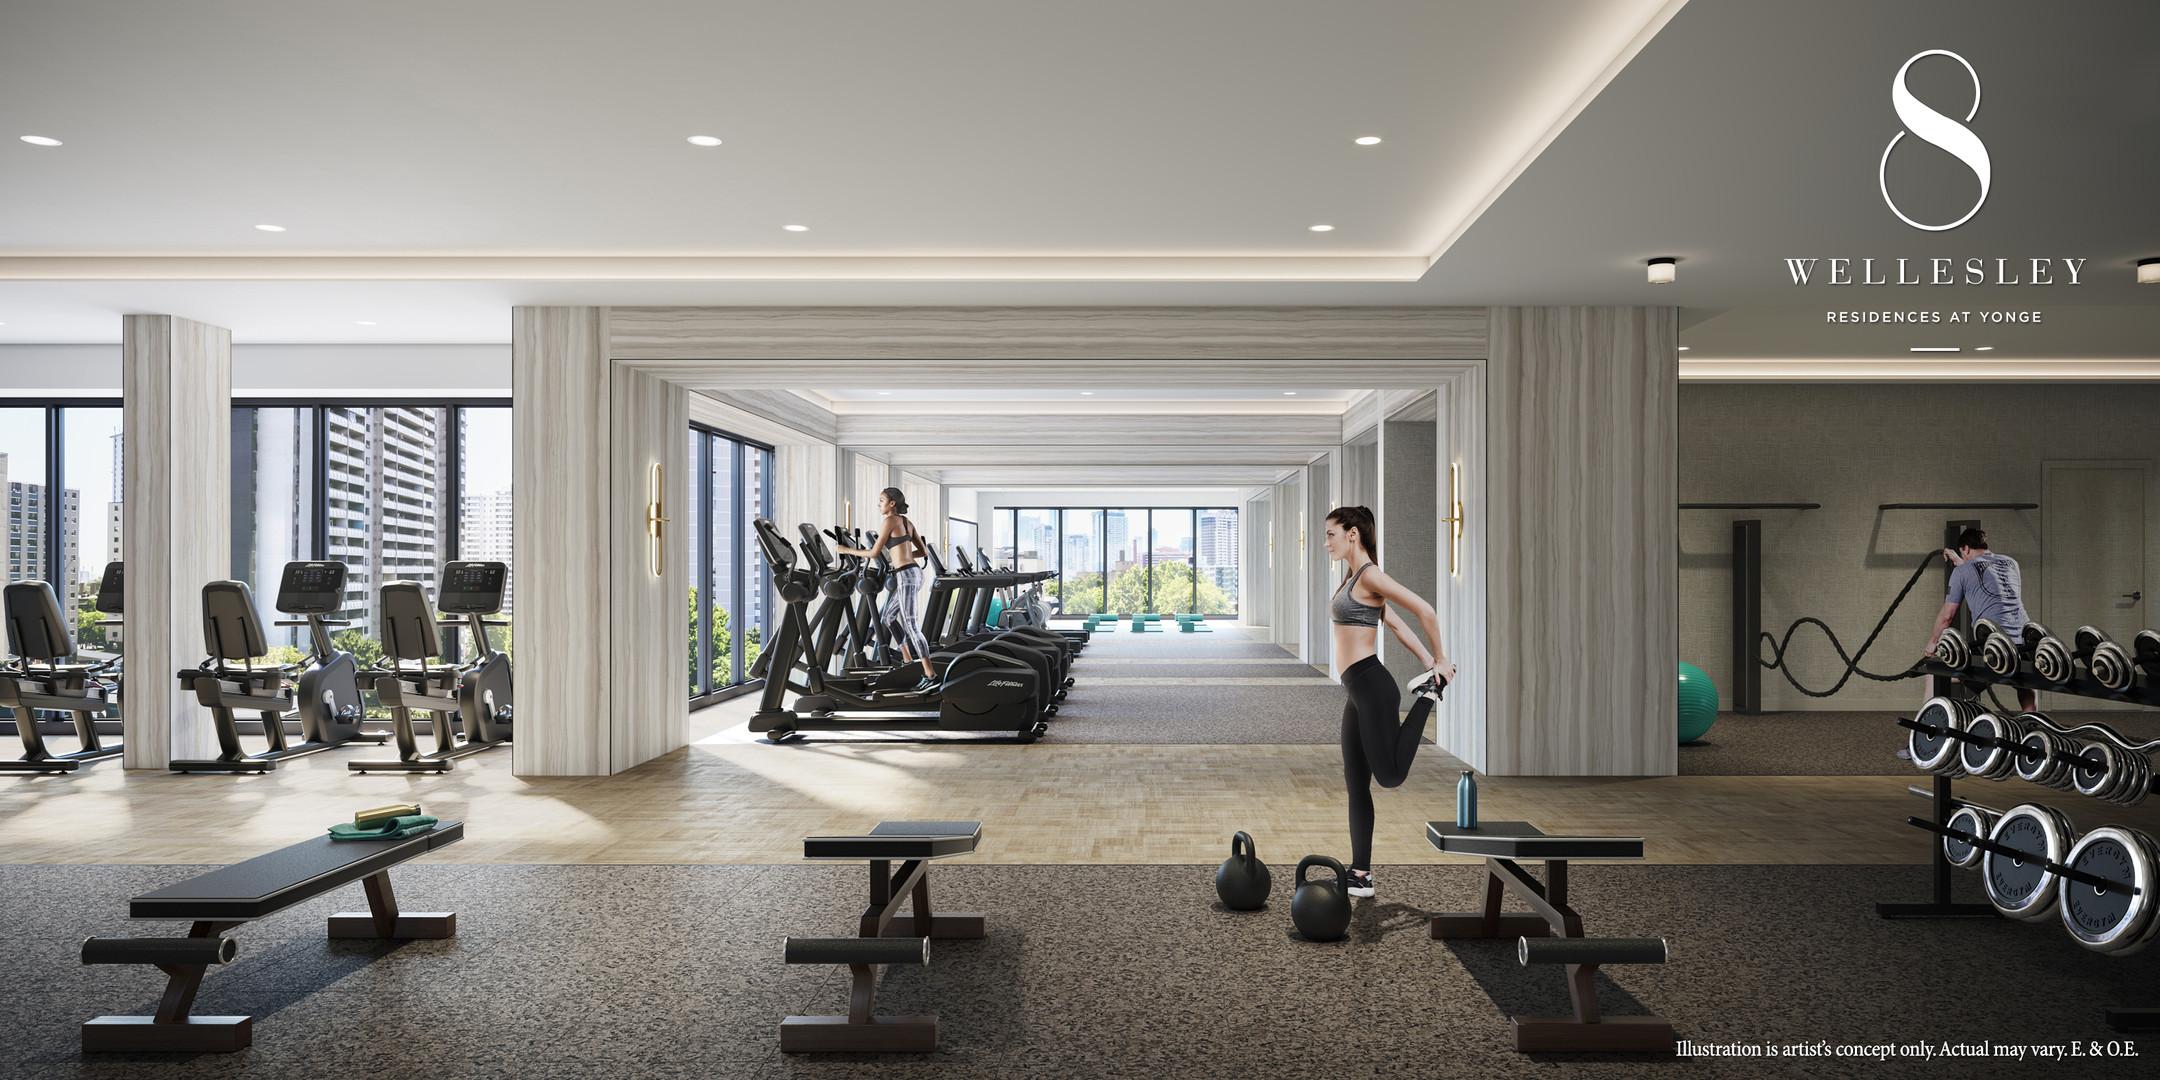 8WState-of-the-art Fitness Centre.jpg